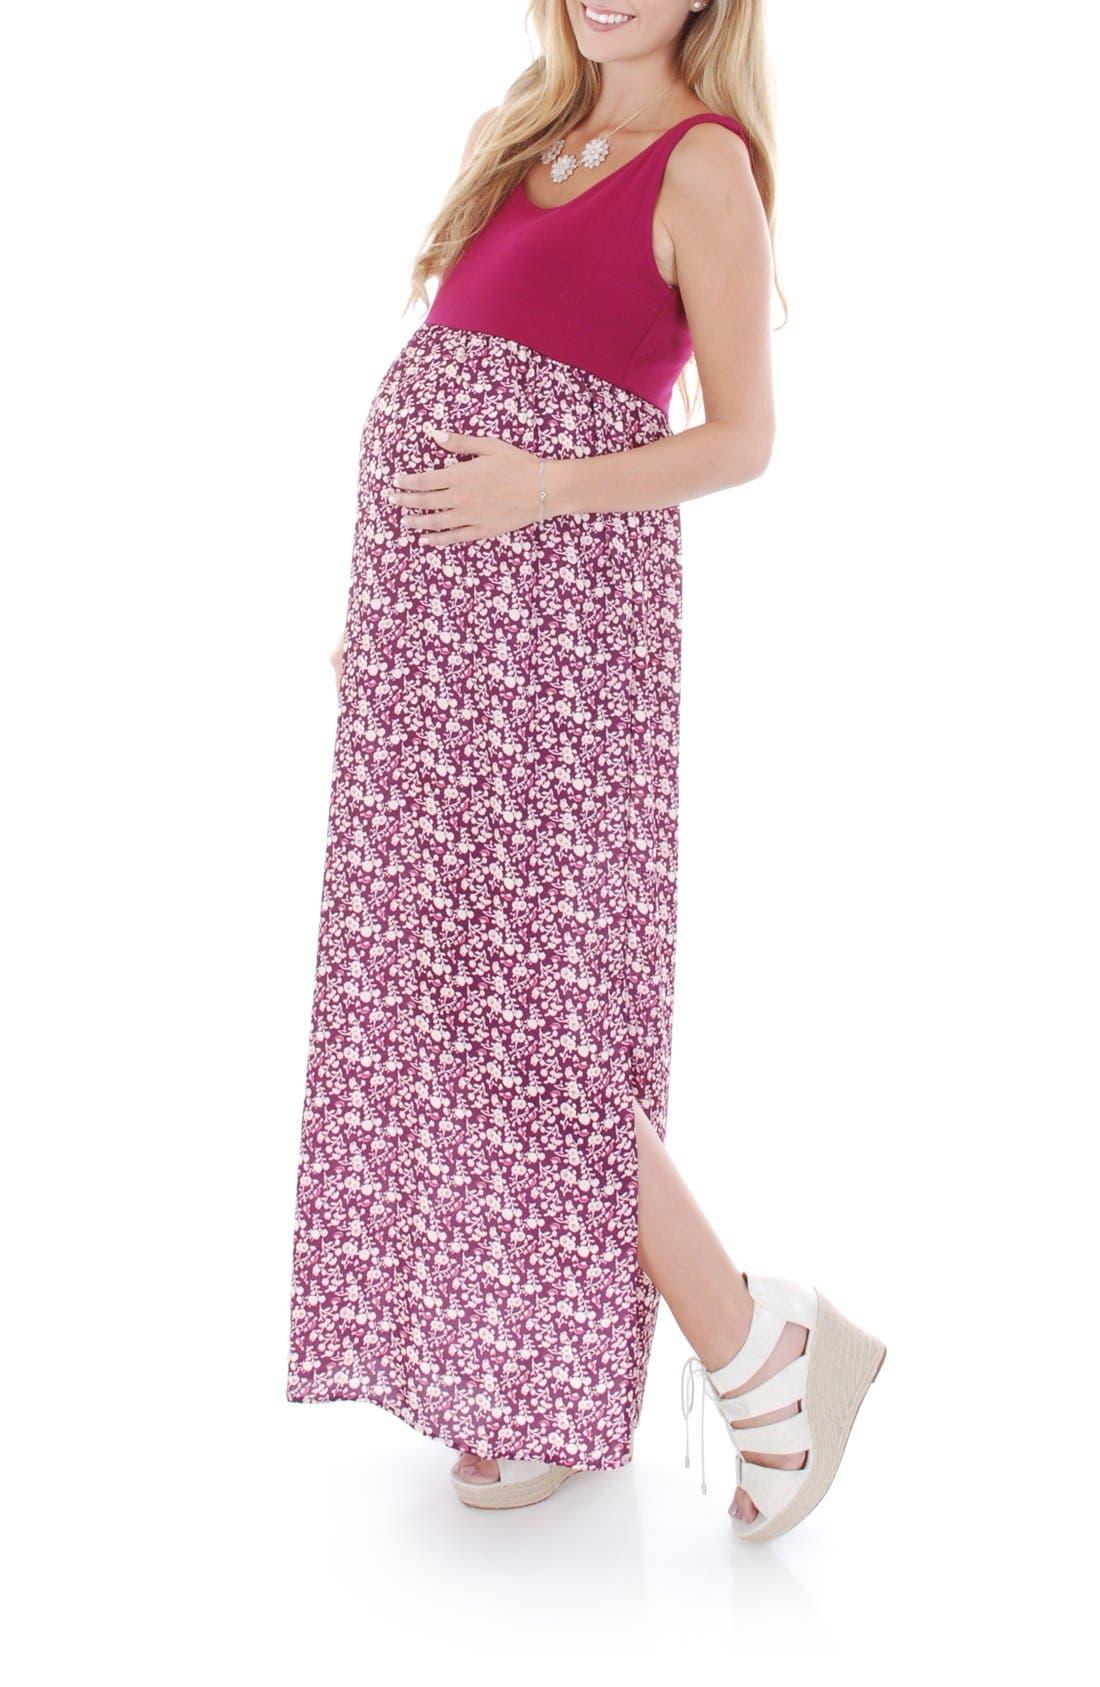 EVERLY GREY Maisie Maternity Maxi Dress